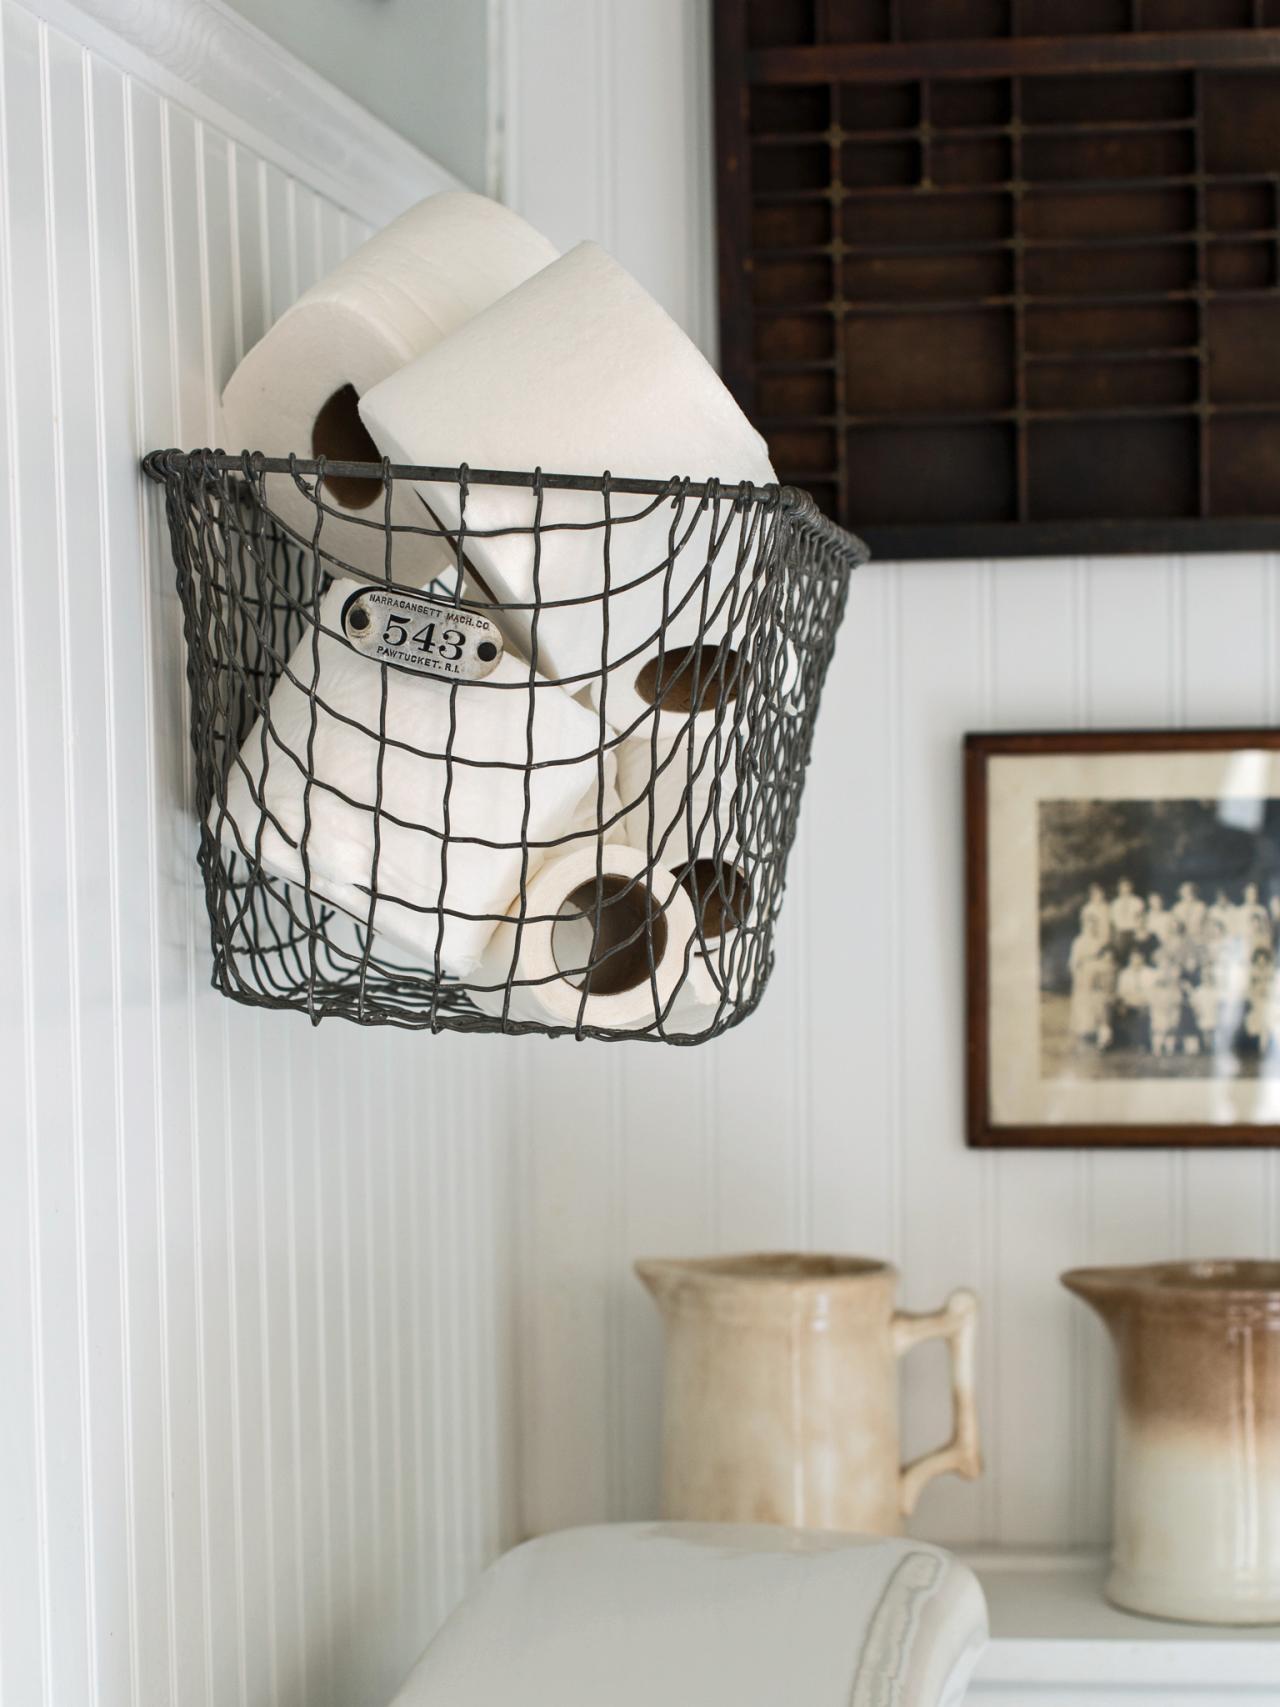 wall hanging baskets for bathroom storage locker basket wall storage ZZYUUWN